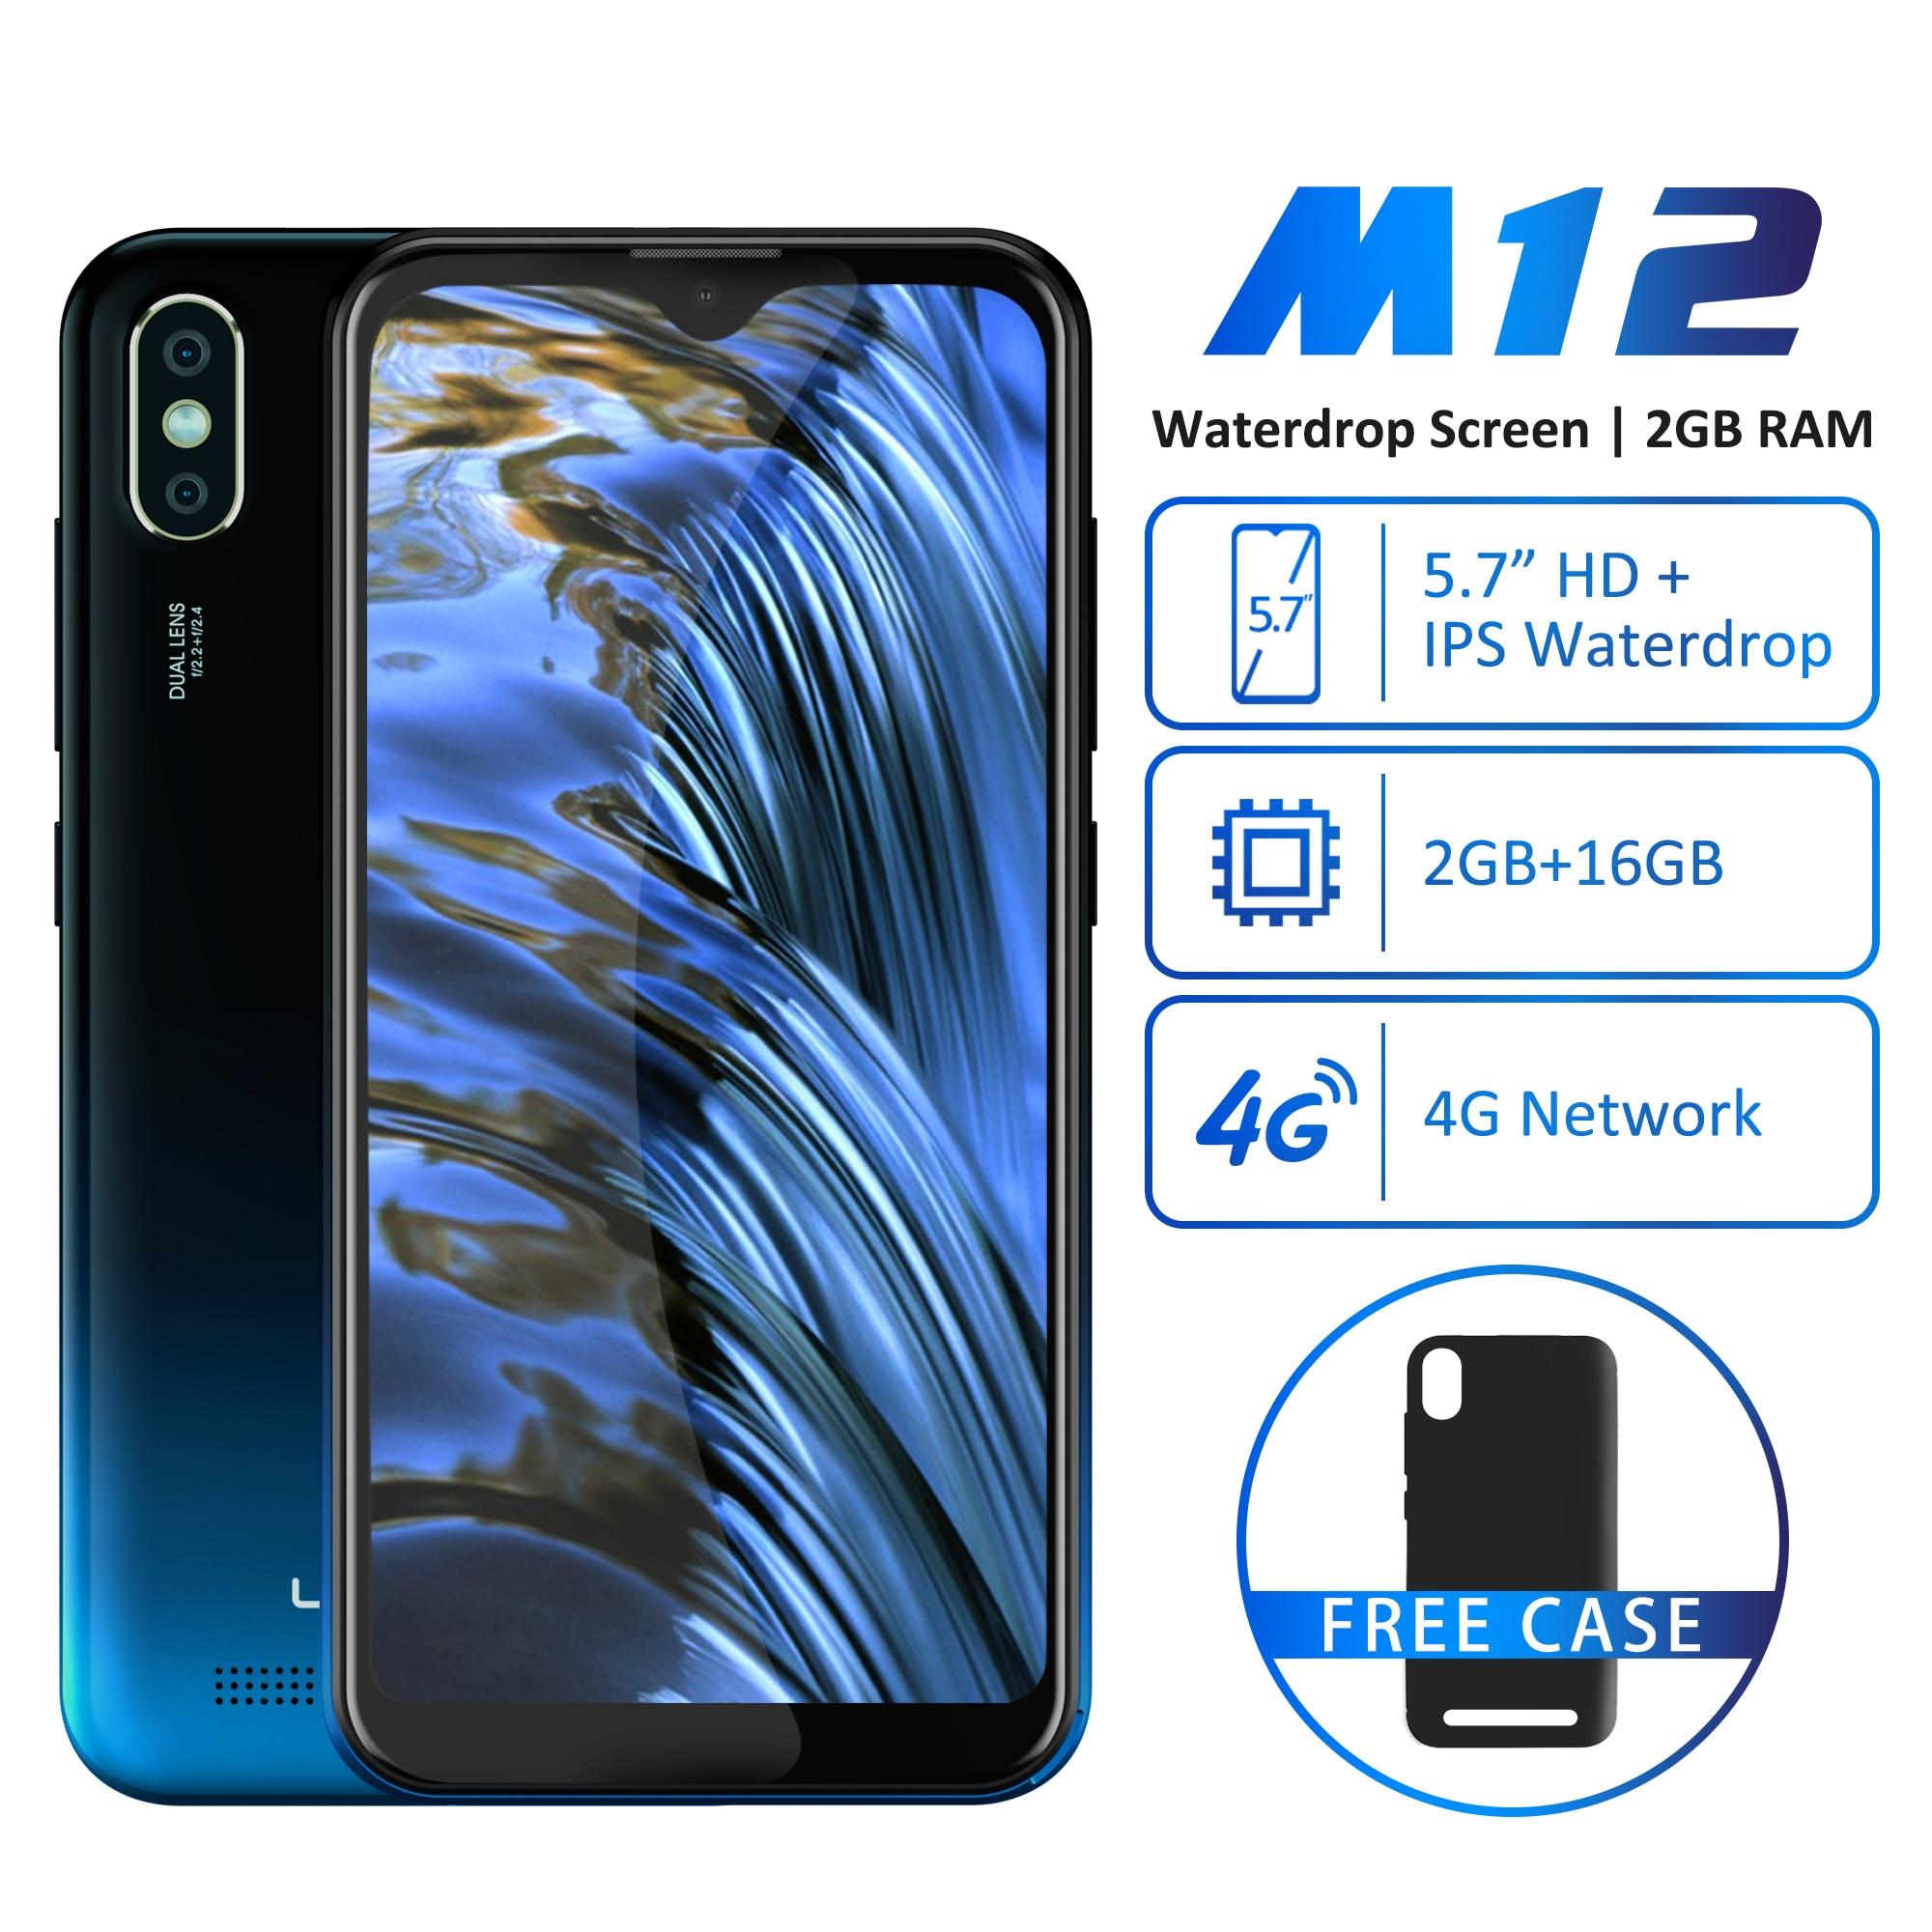 "LEAGOO M12 Android 9.0 Smartphone 5.7"" Water-drop 19:9 Screen 2GB RAM 16GB ROM MT6739WW Quad Core Fingerprint Face ID 4G Mobile"